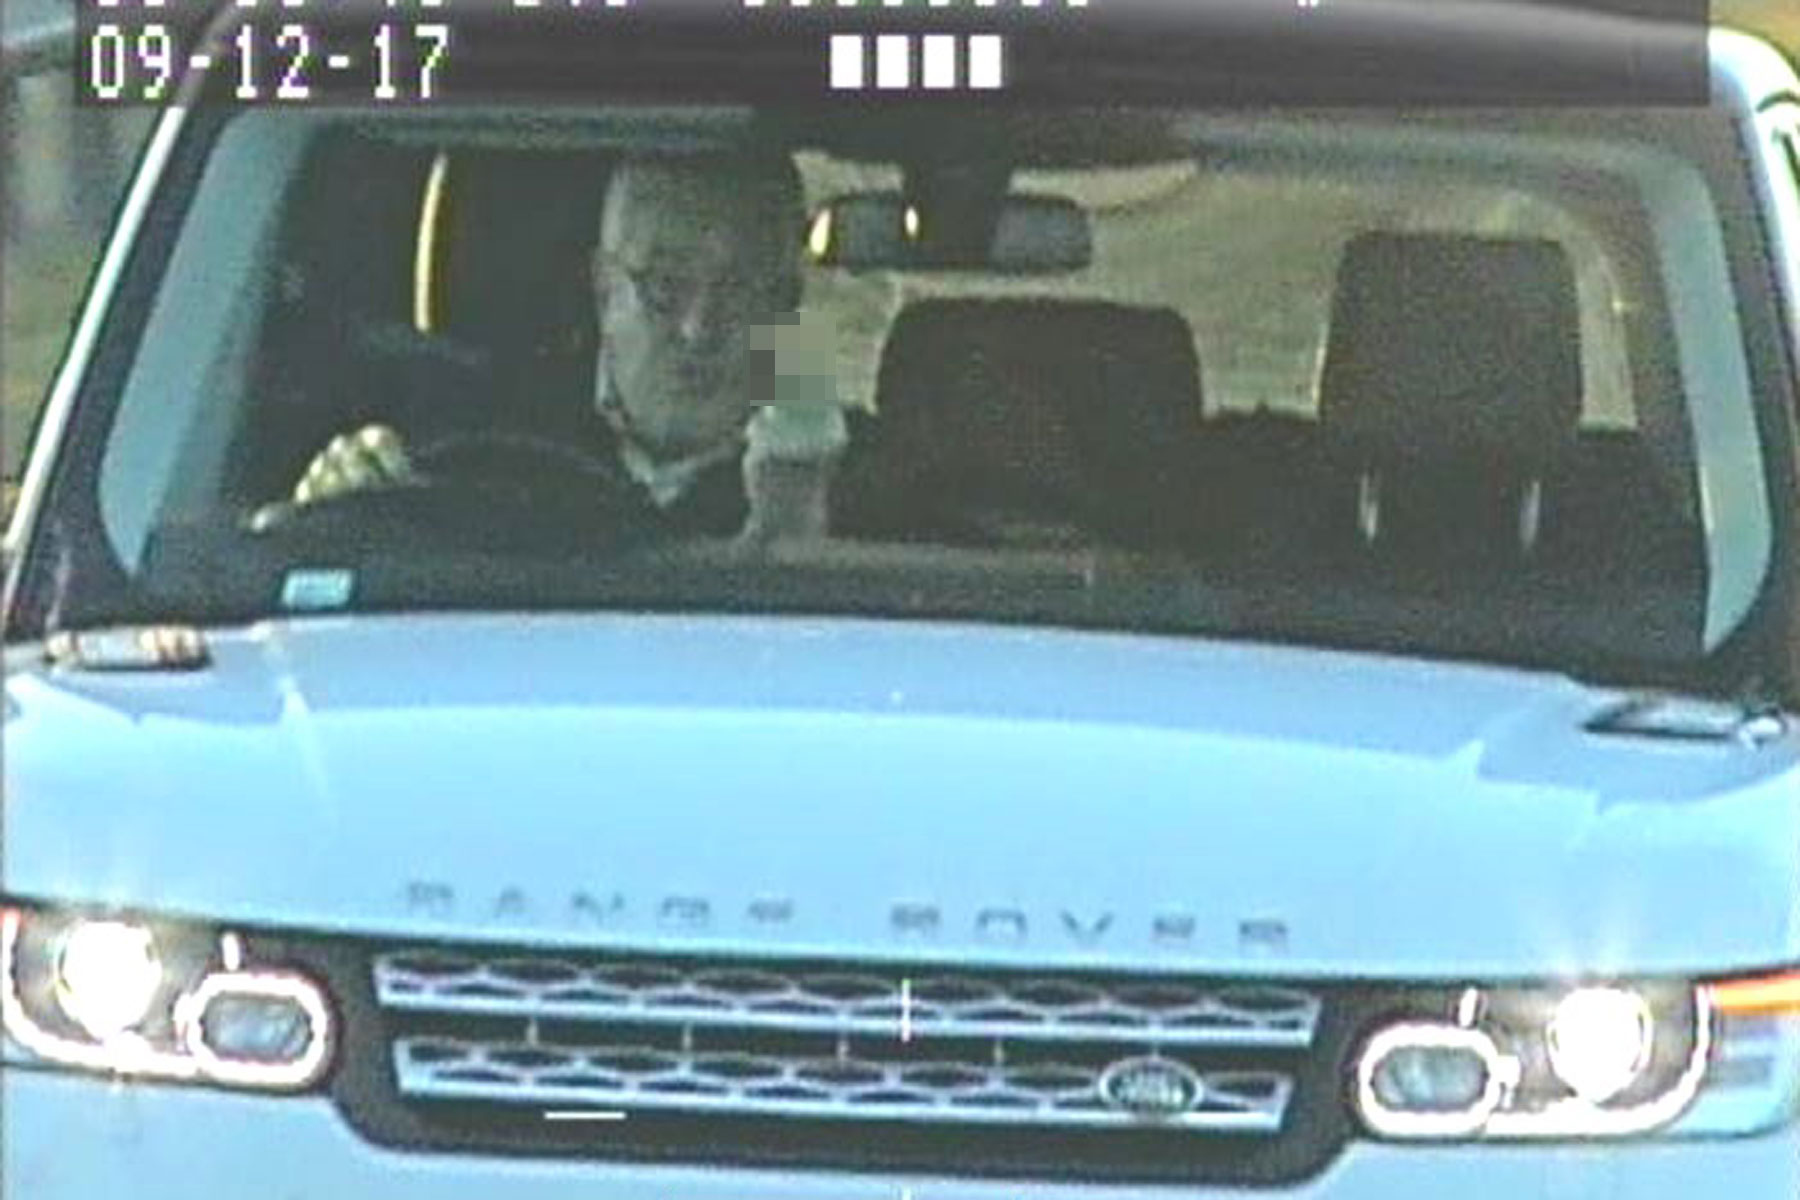 Range Rover driver jailed for giving police the finger